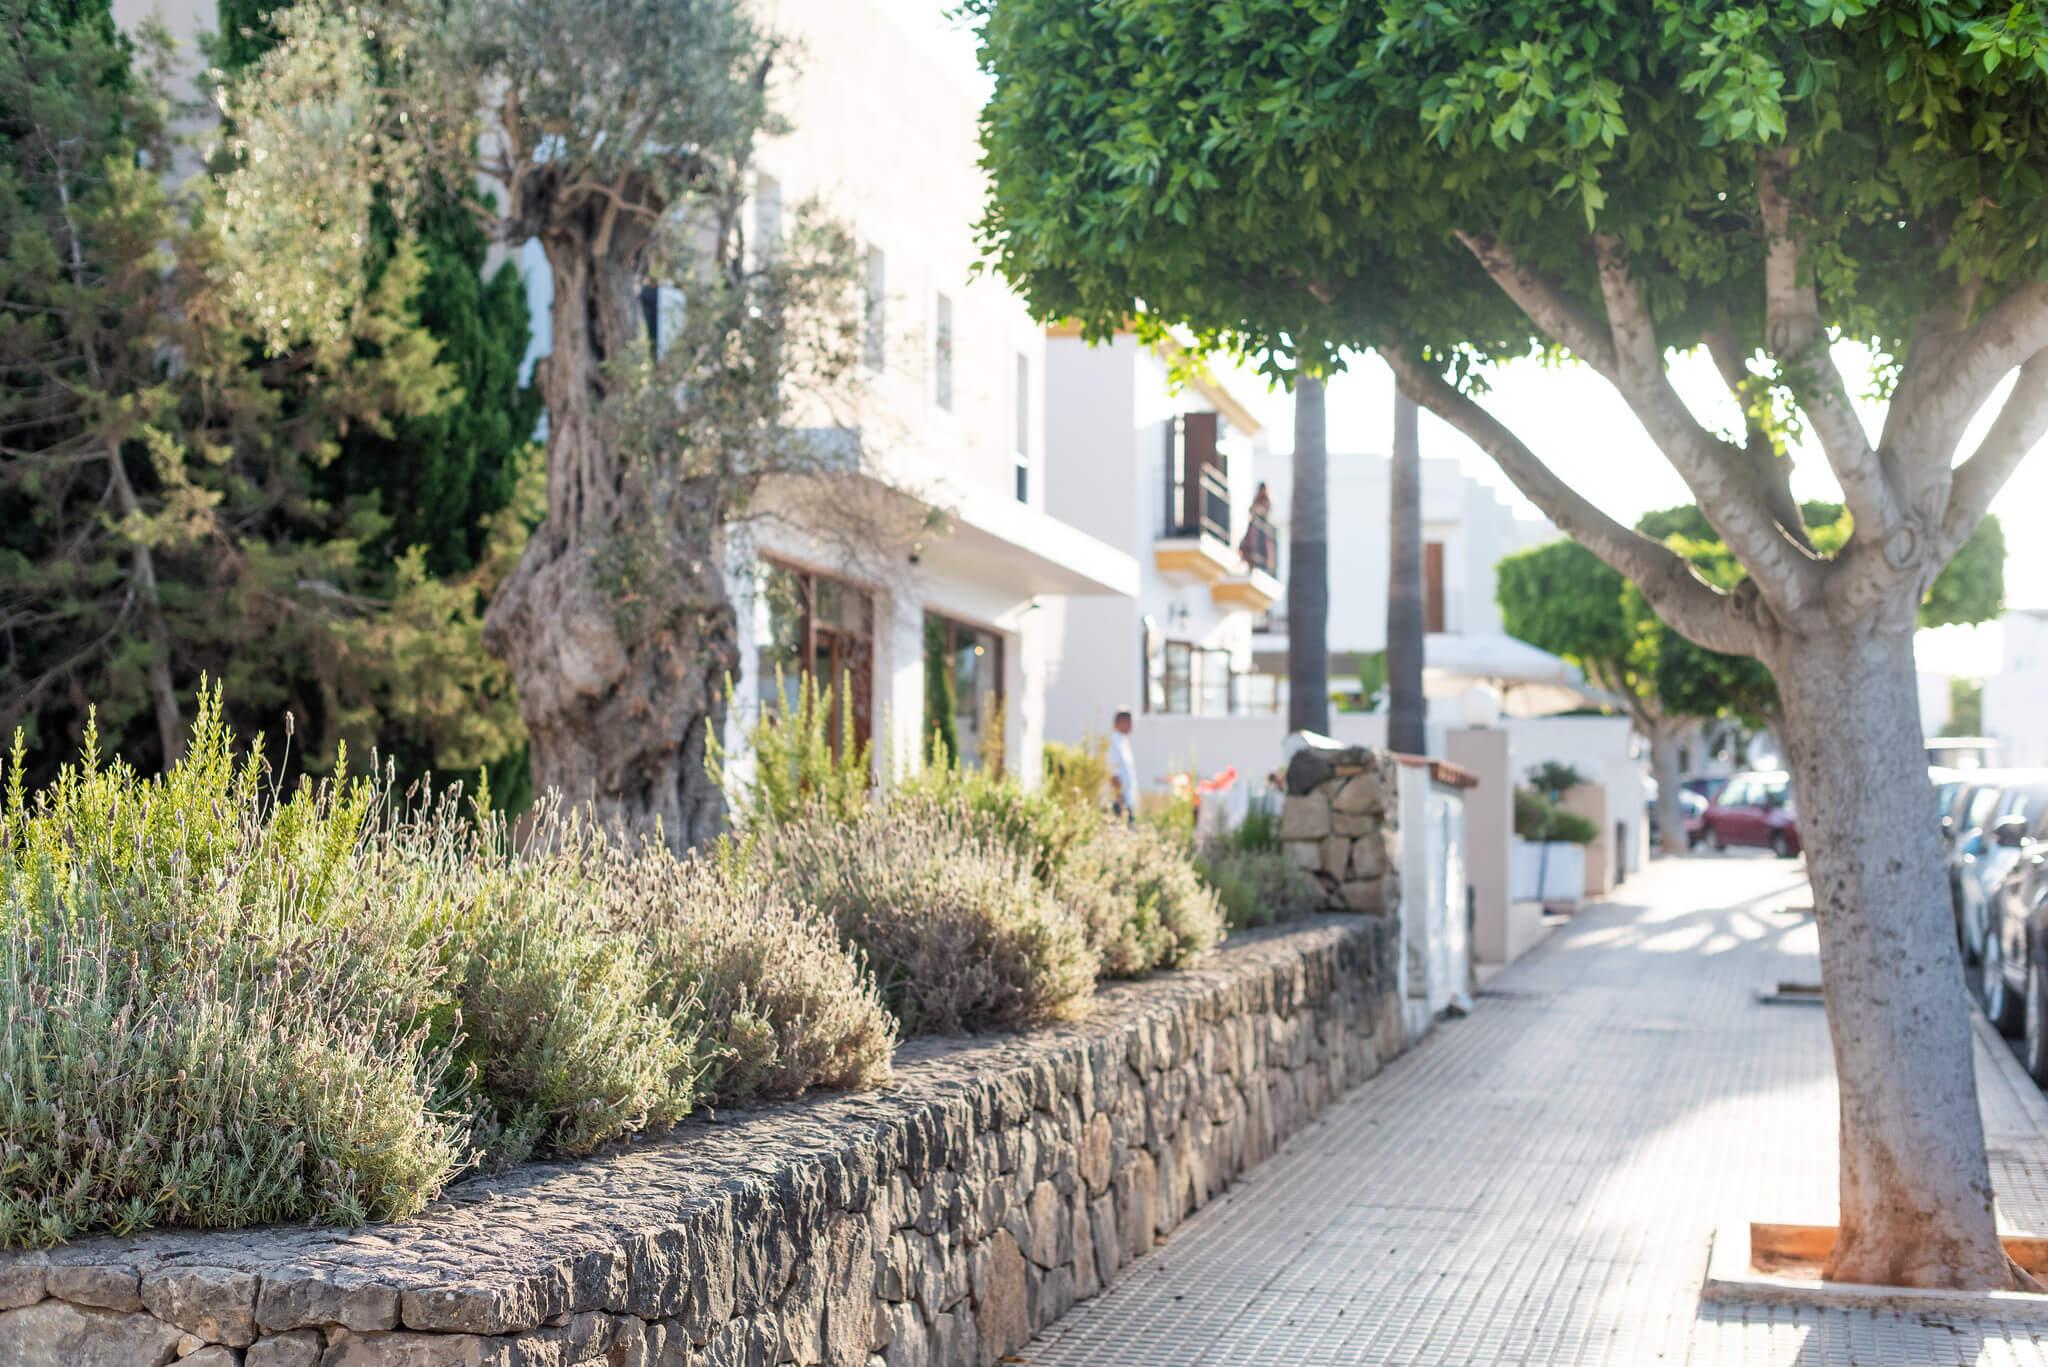 https://www.white-ibiza.com/wp-content/uploads/2020/05/white-ibiza-villas-where-to-buy-santa-gertrudis-02.jpg